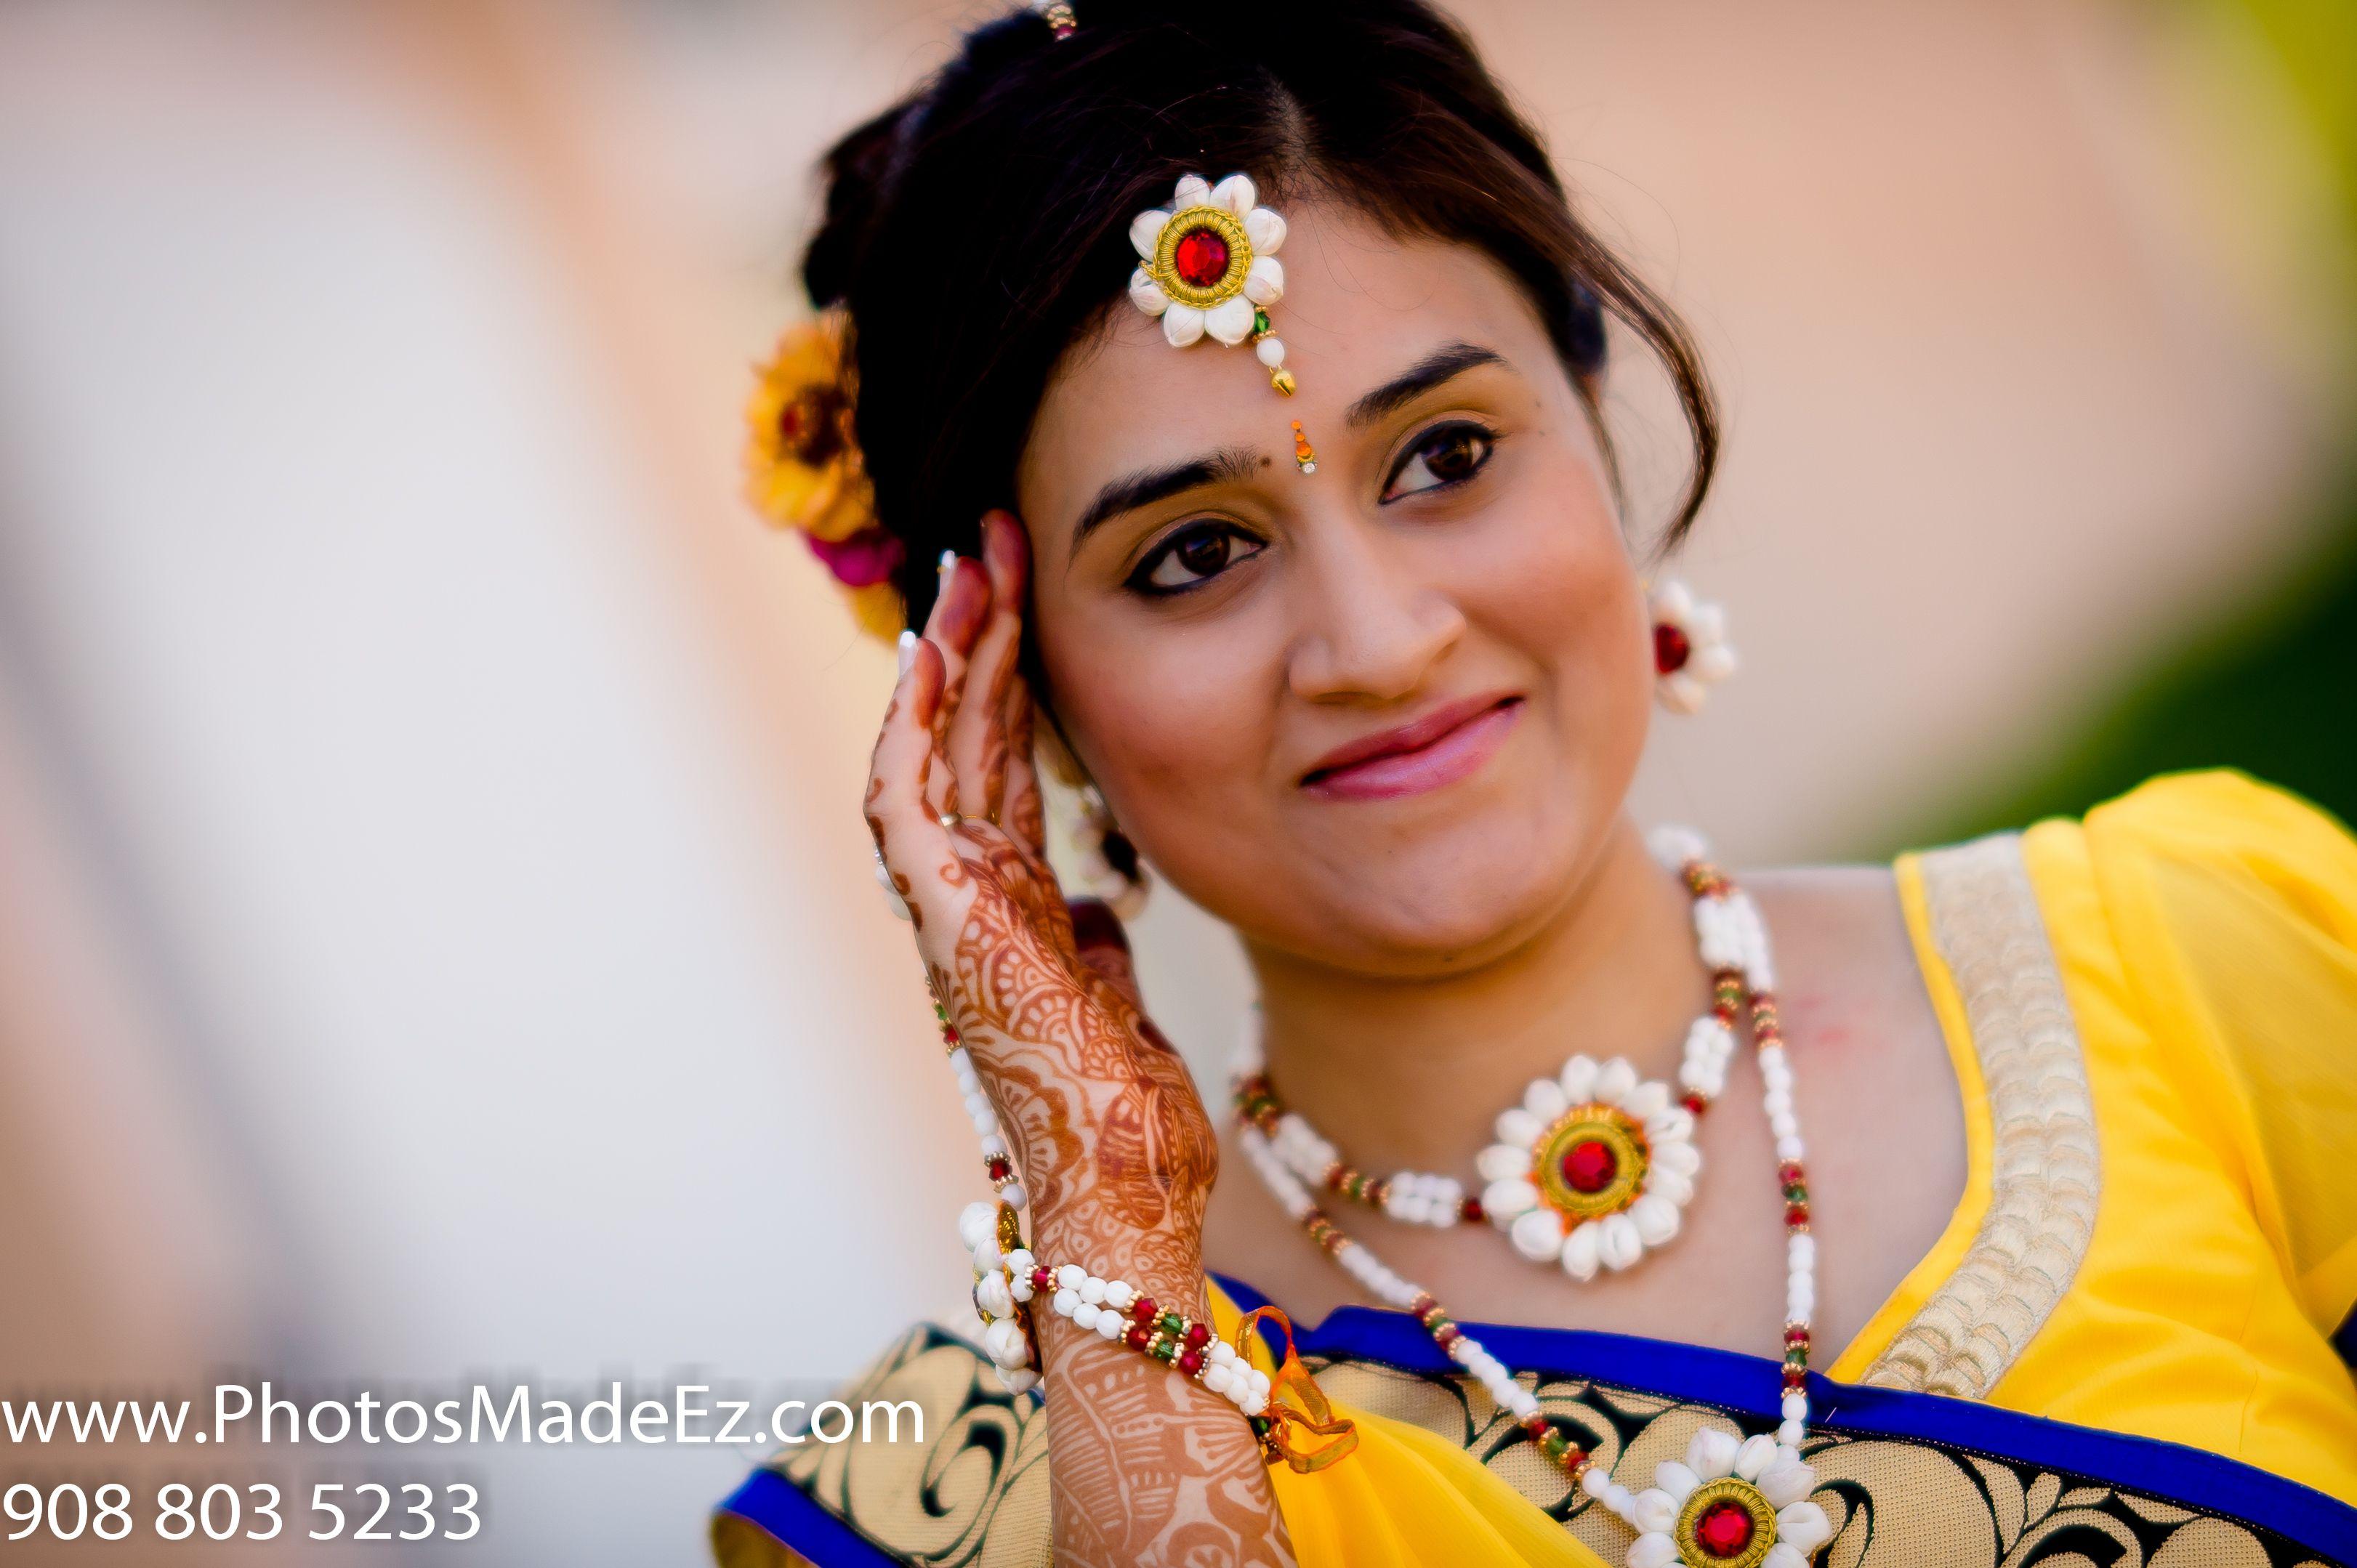 Mehndi Makeup Artist : Bridal mehndi photo bridalmehendi newjerseywedding